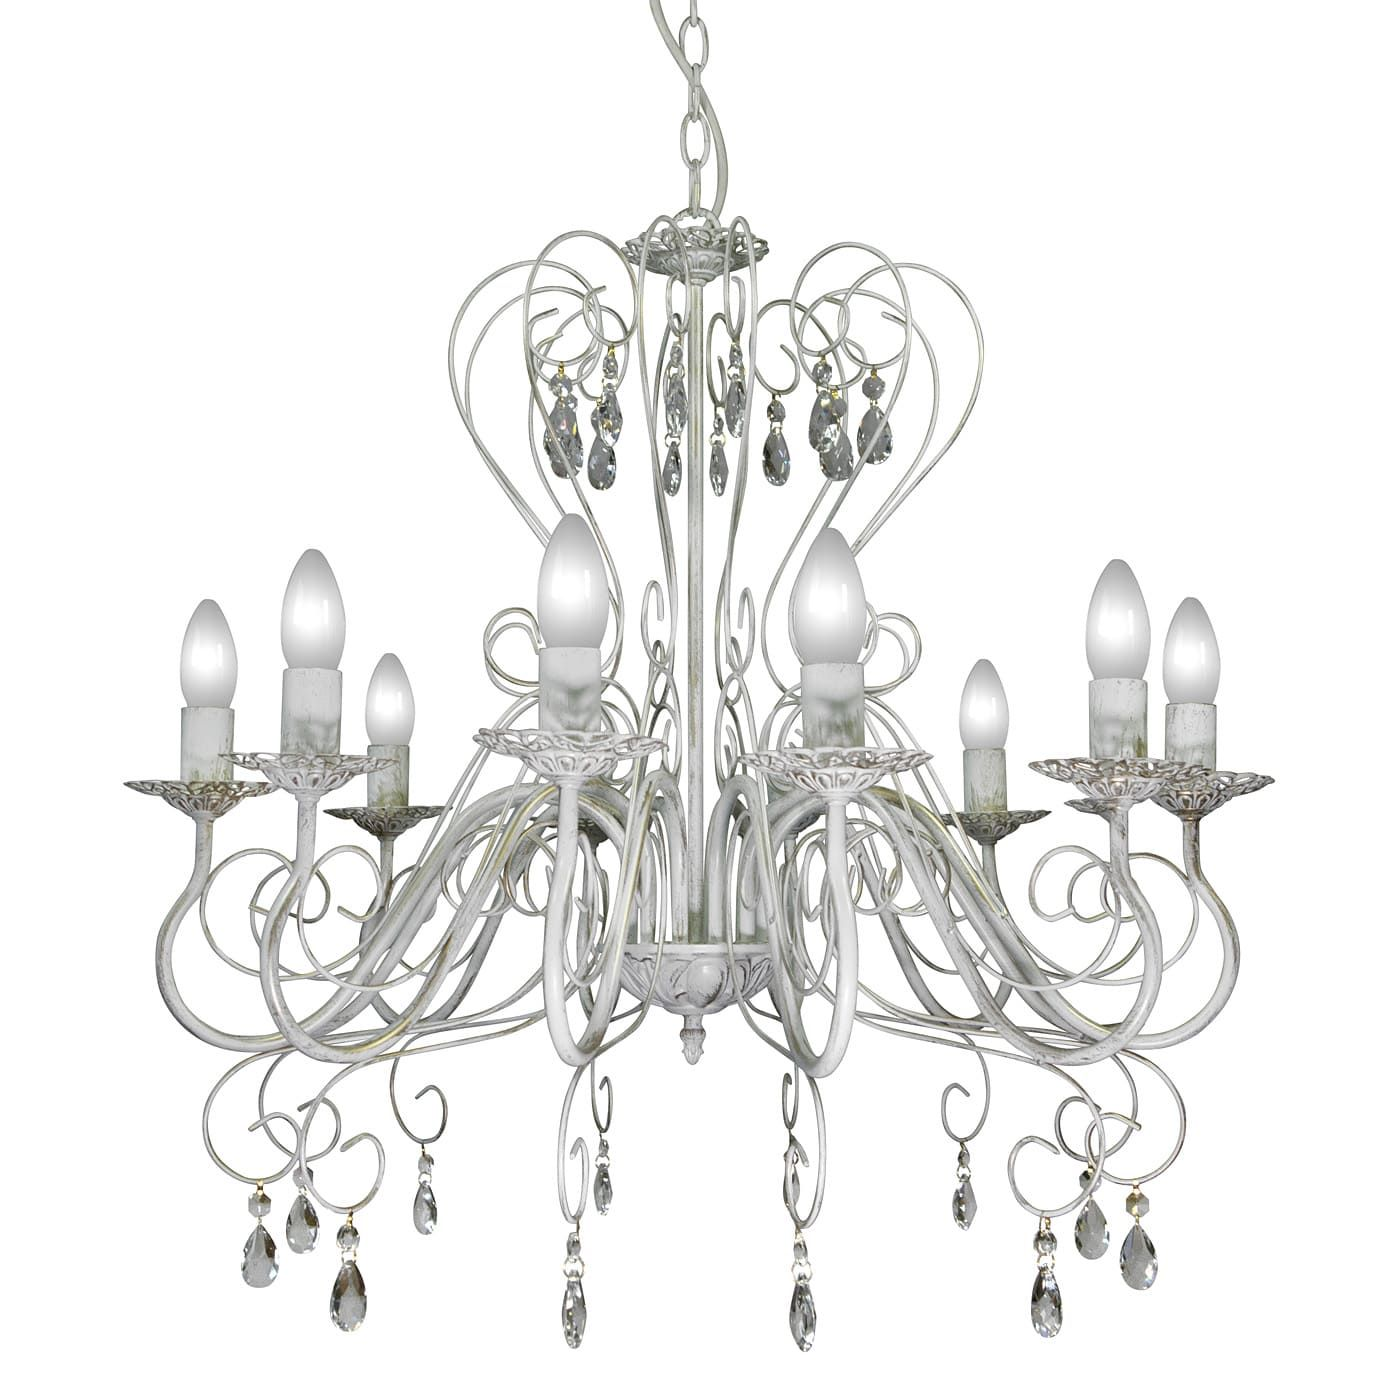 PETRASVET / Pendant chandelier S1021-10, 10xE14 max. 60W